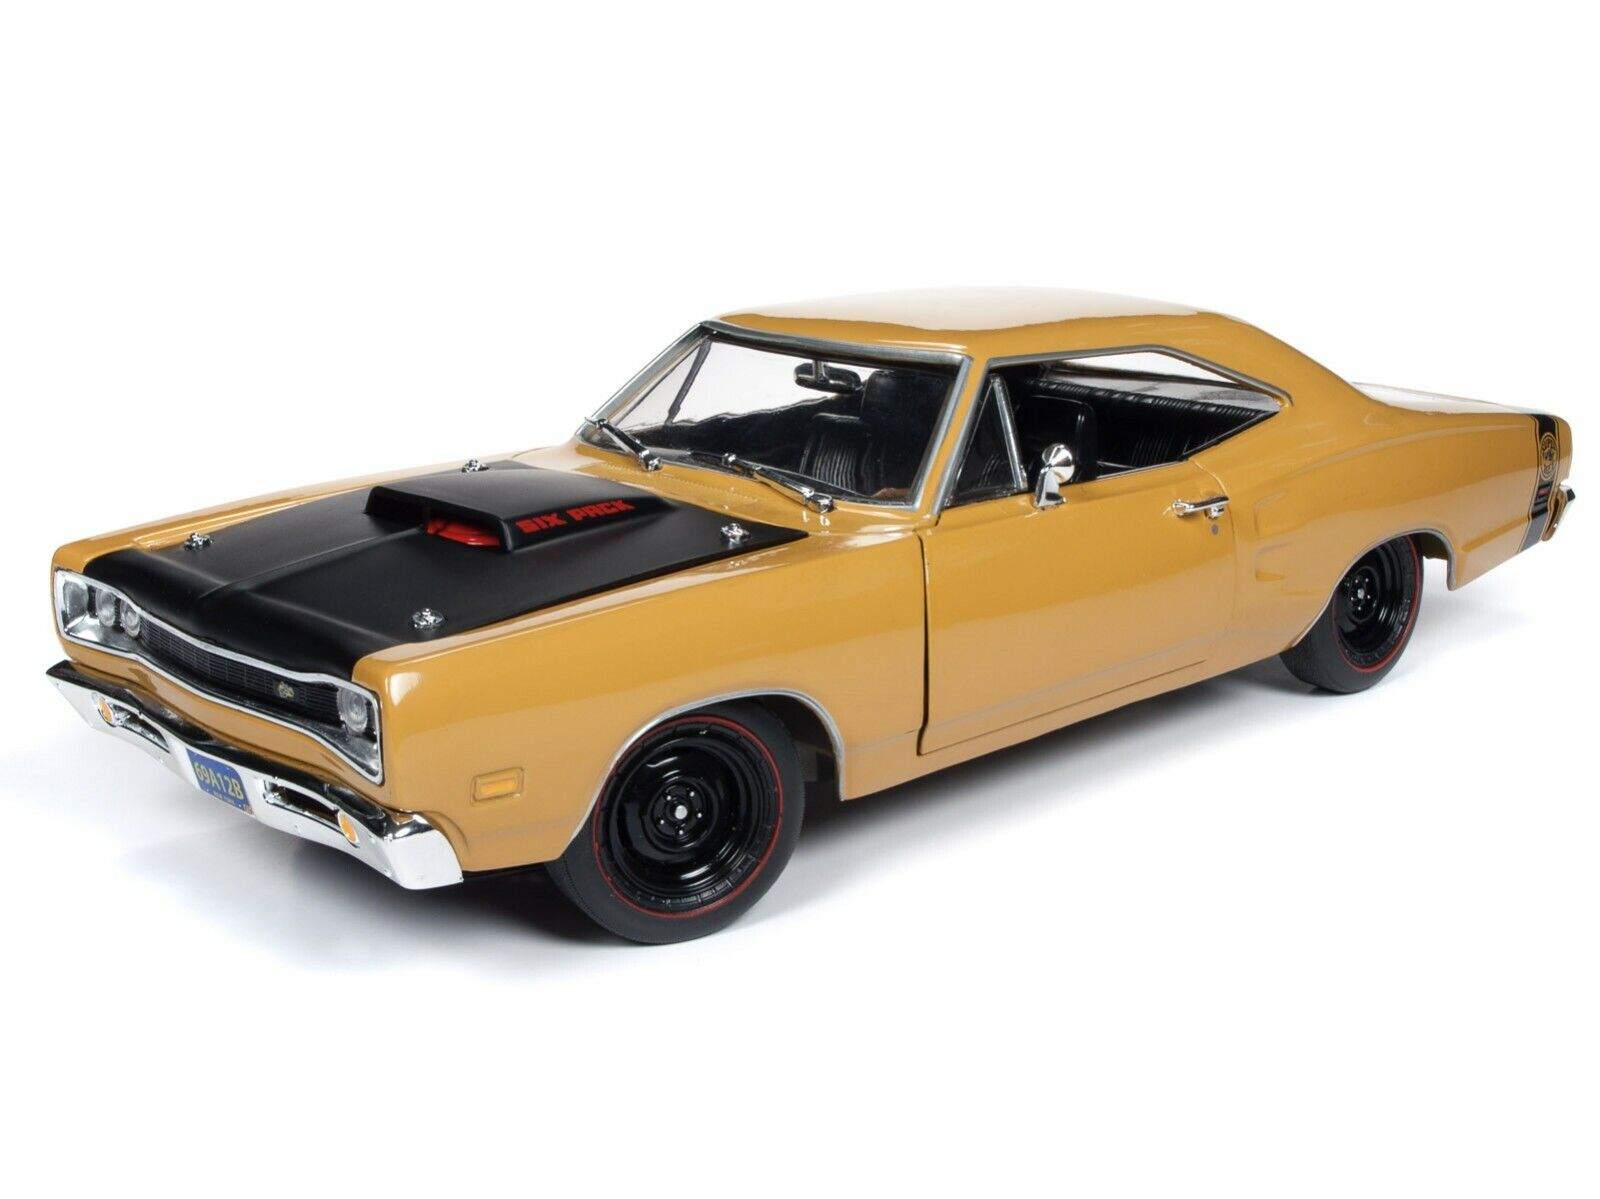 2019 1 18 AUTO WORLD AMERICAN MUSCLE BUTTERSCTOCH 1969½ Dodge SUPER BEE NIB